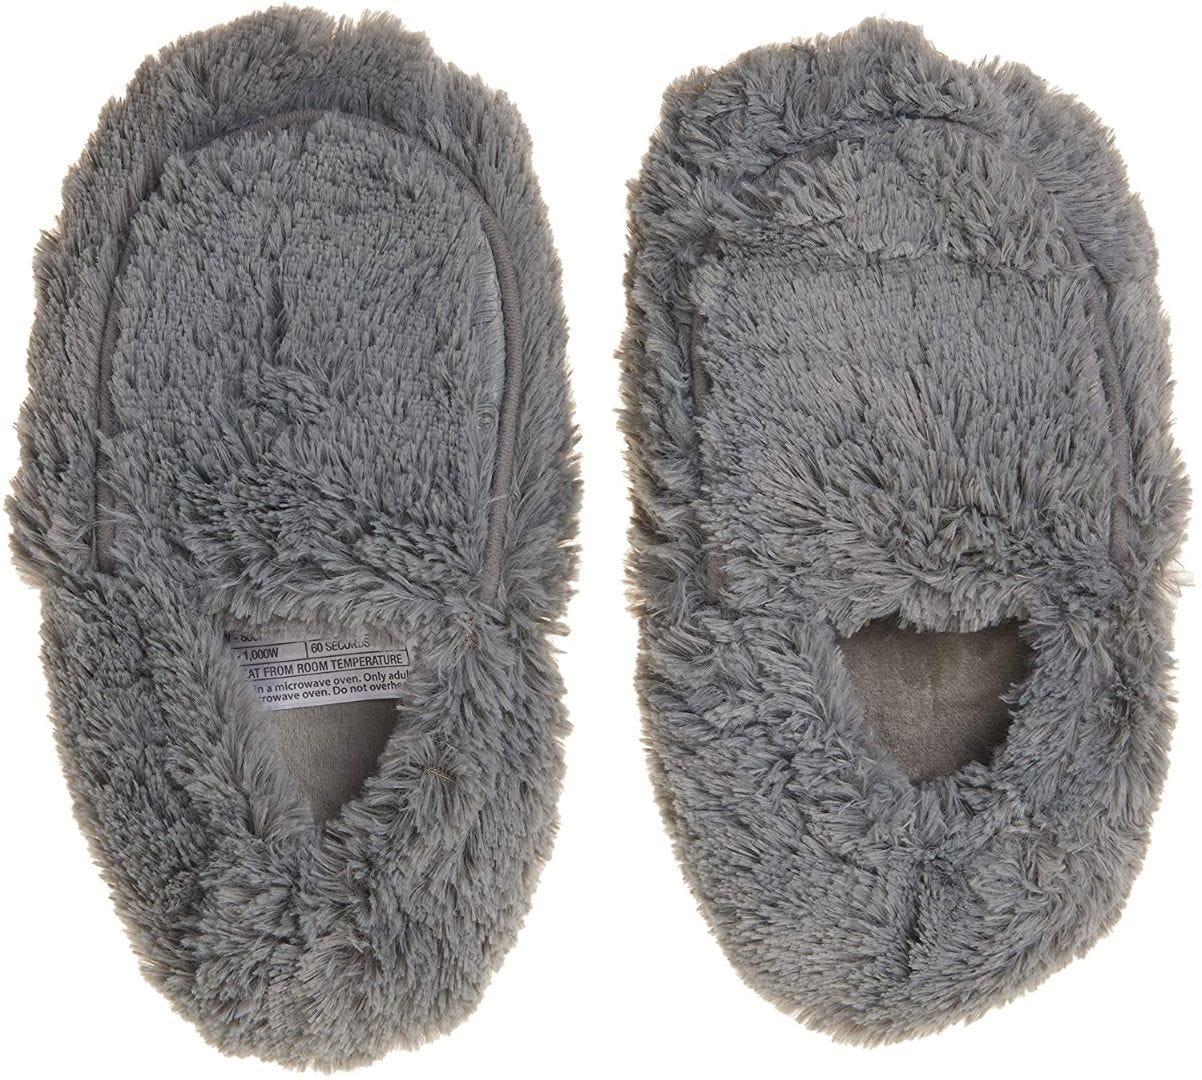 Gray fuzzy slippers.